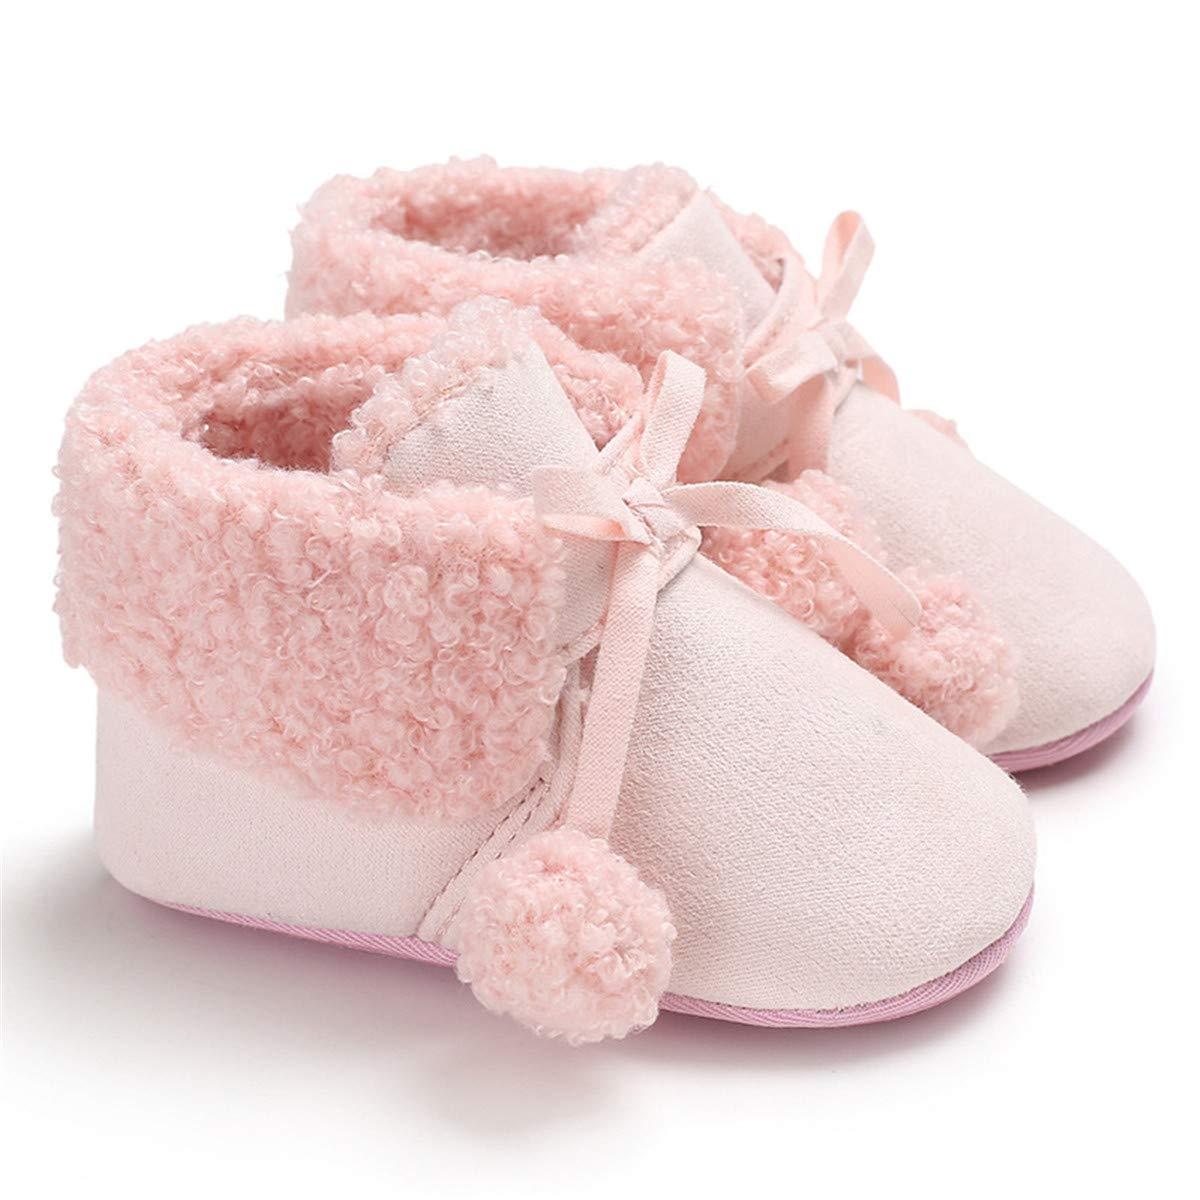 Sakuracan Infant Baby Boys Girls Slippers Cozy Fleece Booties with Anti-Slip Bottom Cartoon Socks Newborn Crib First Walkers Shoes